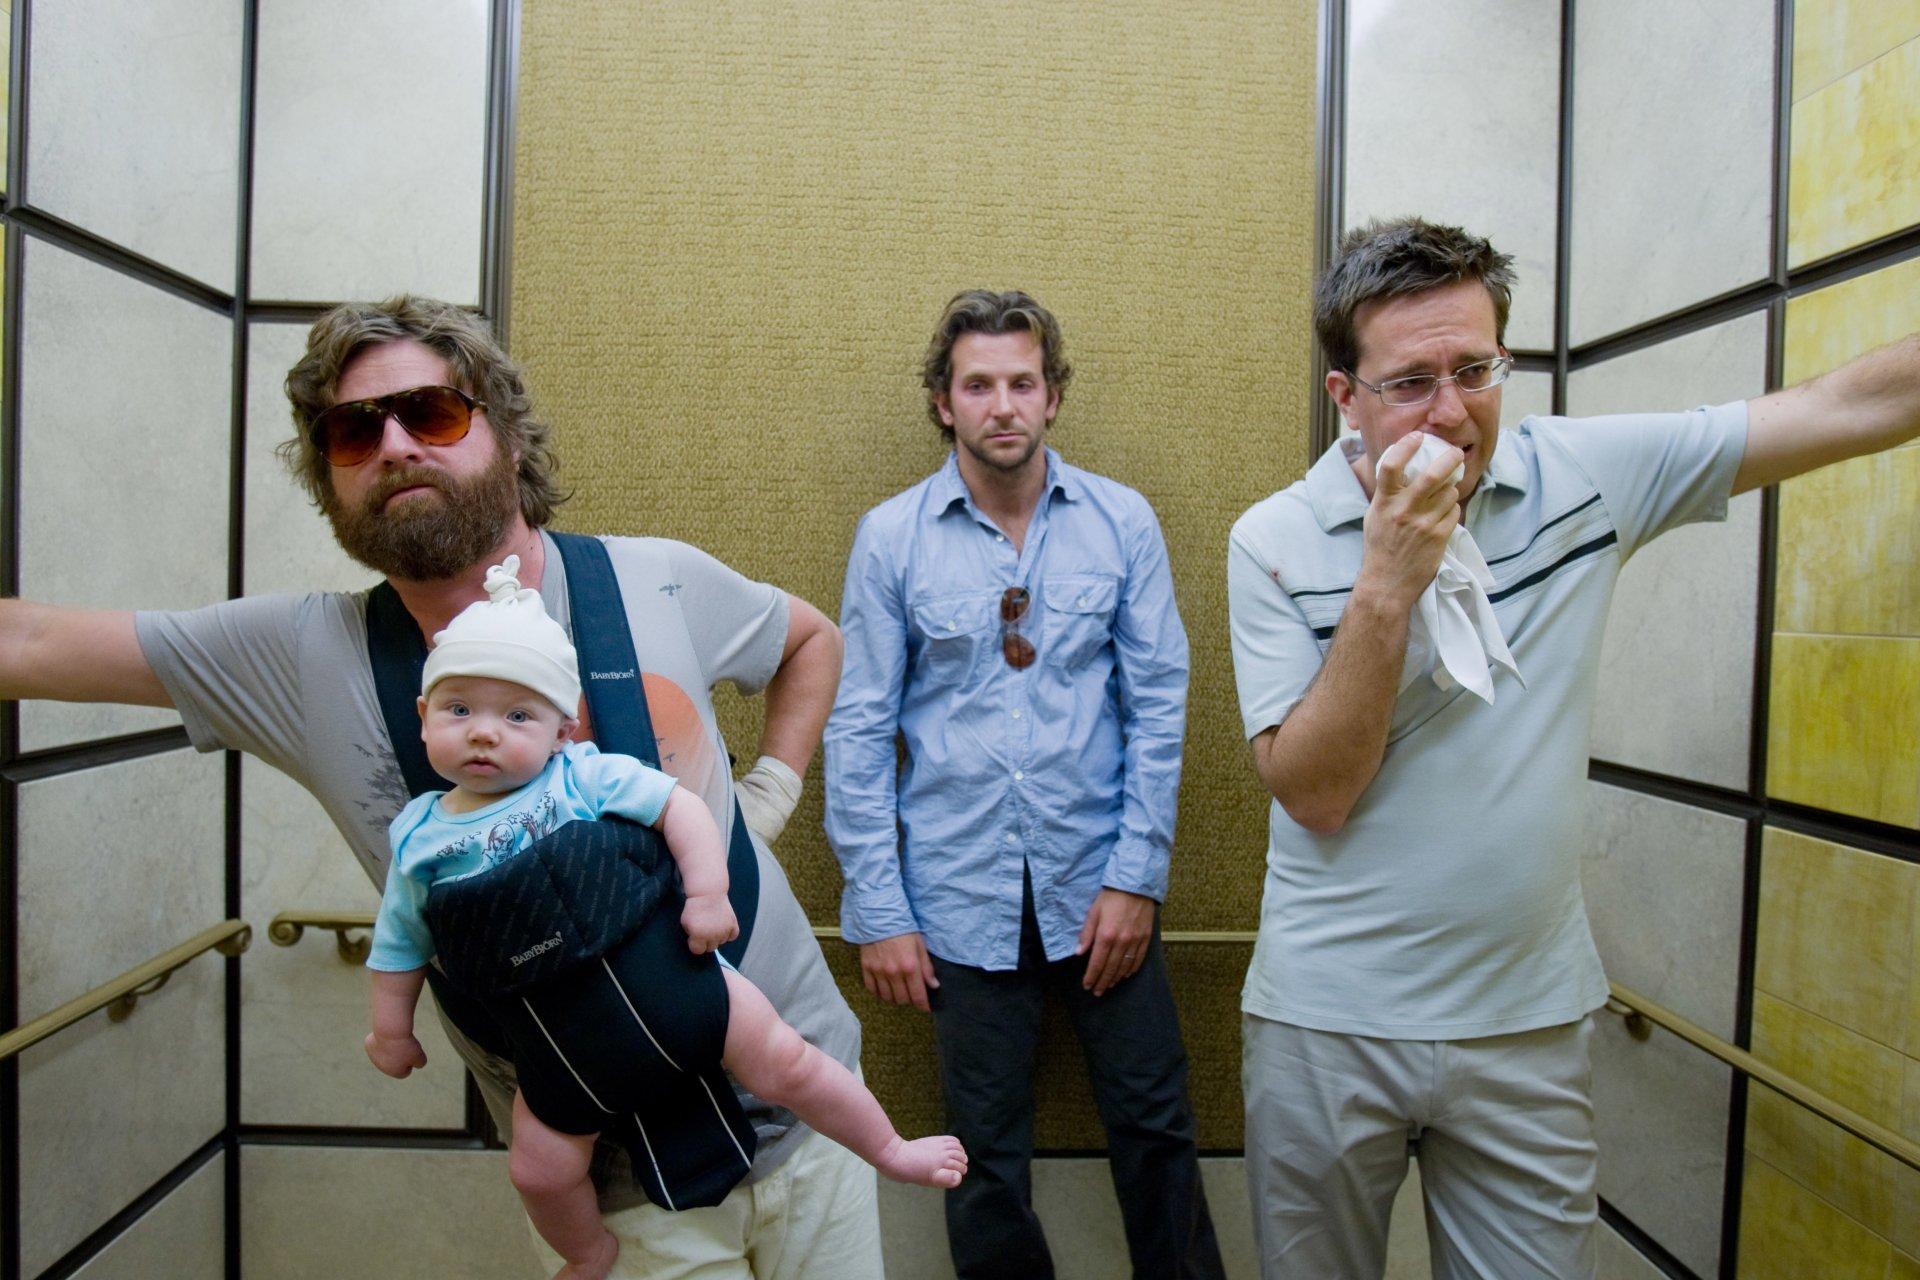 Movie - The Hangover  Bradley Cooper Ed Helms Zach Galifianakis Wallpaper